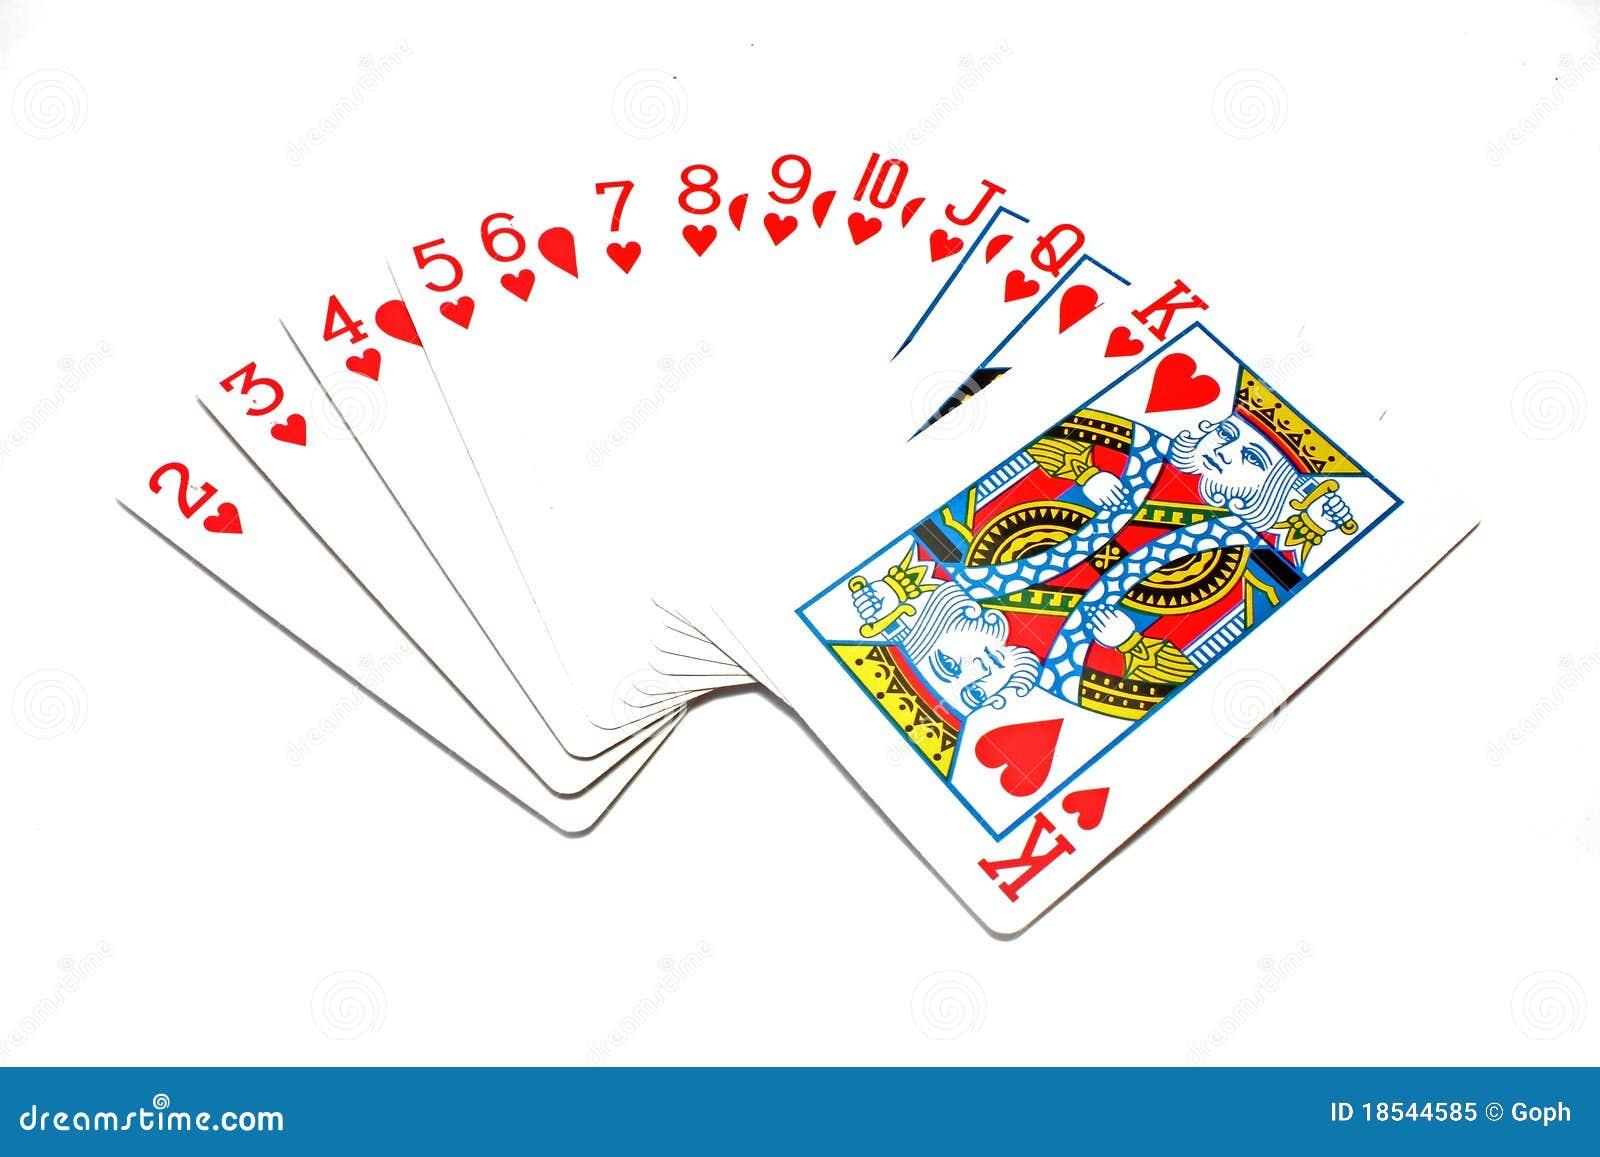 Safest online casino games canada